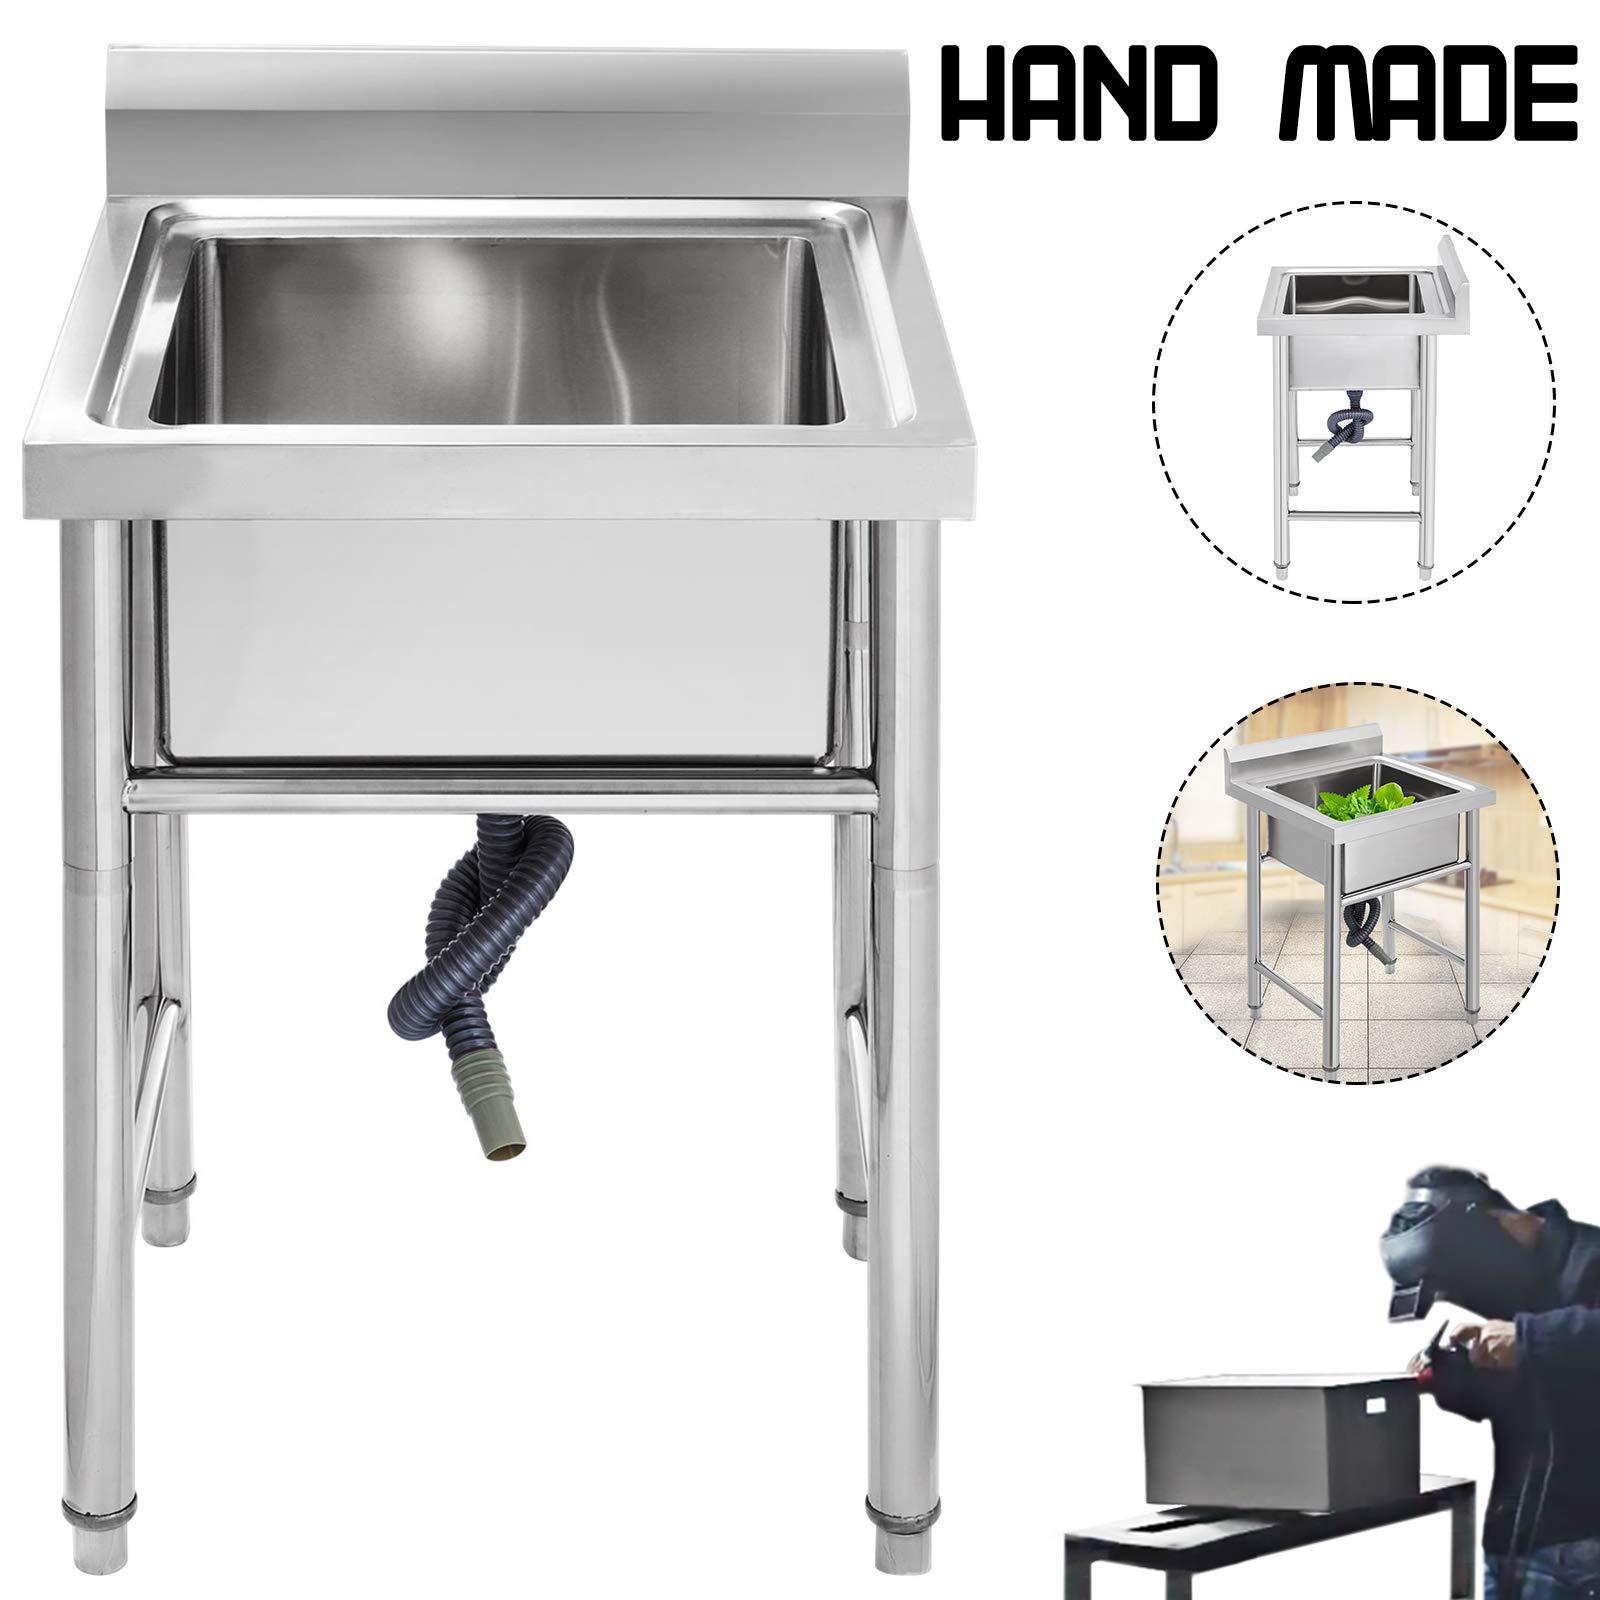 Mophorn Stainless Steel Bar Sink Commercial Standard Underbar Sink for bar kitchen restaurant (1 Compartment 17.5 Inch)